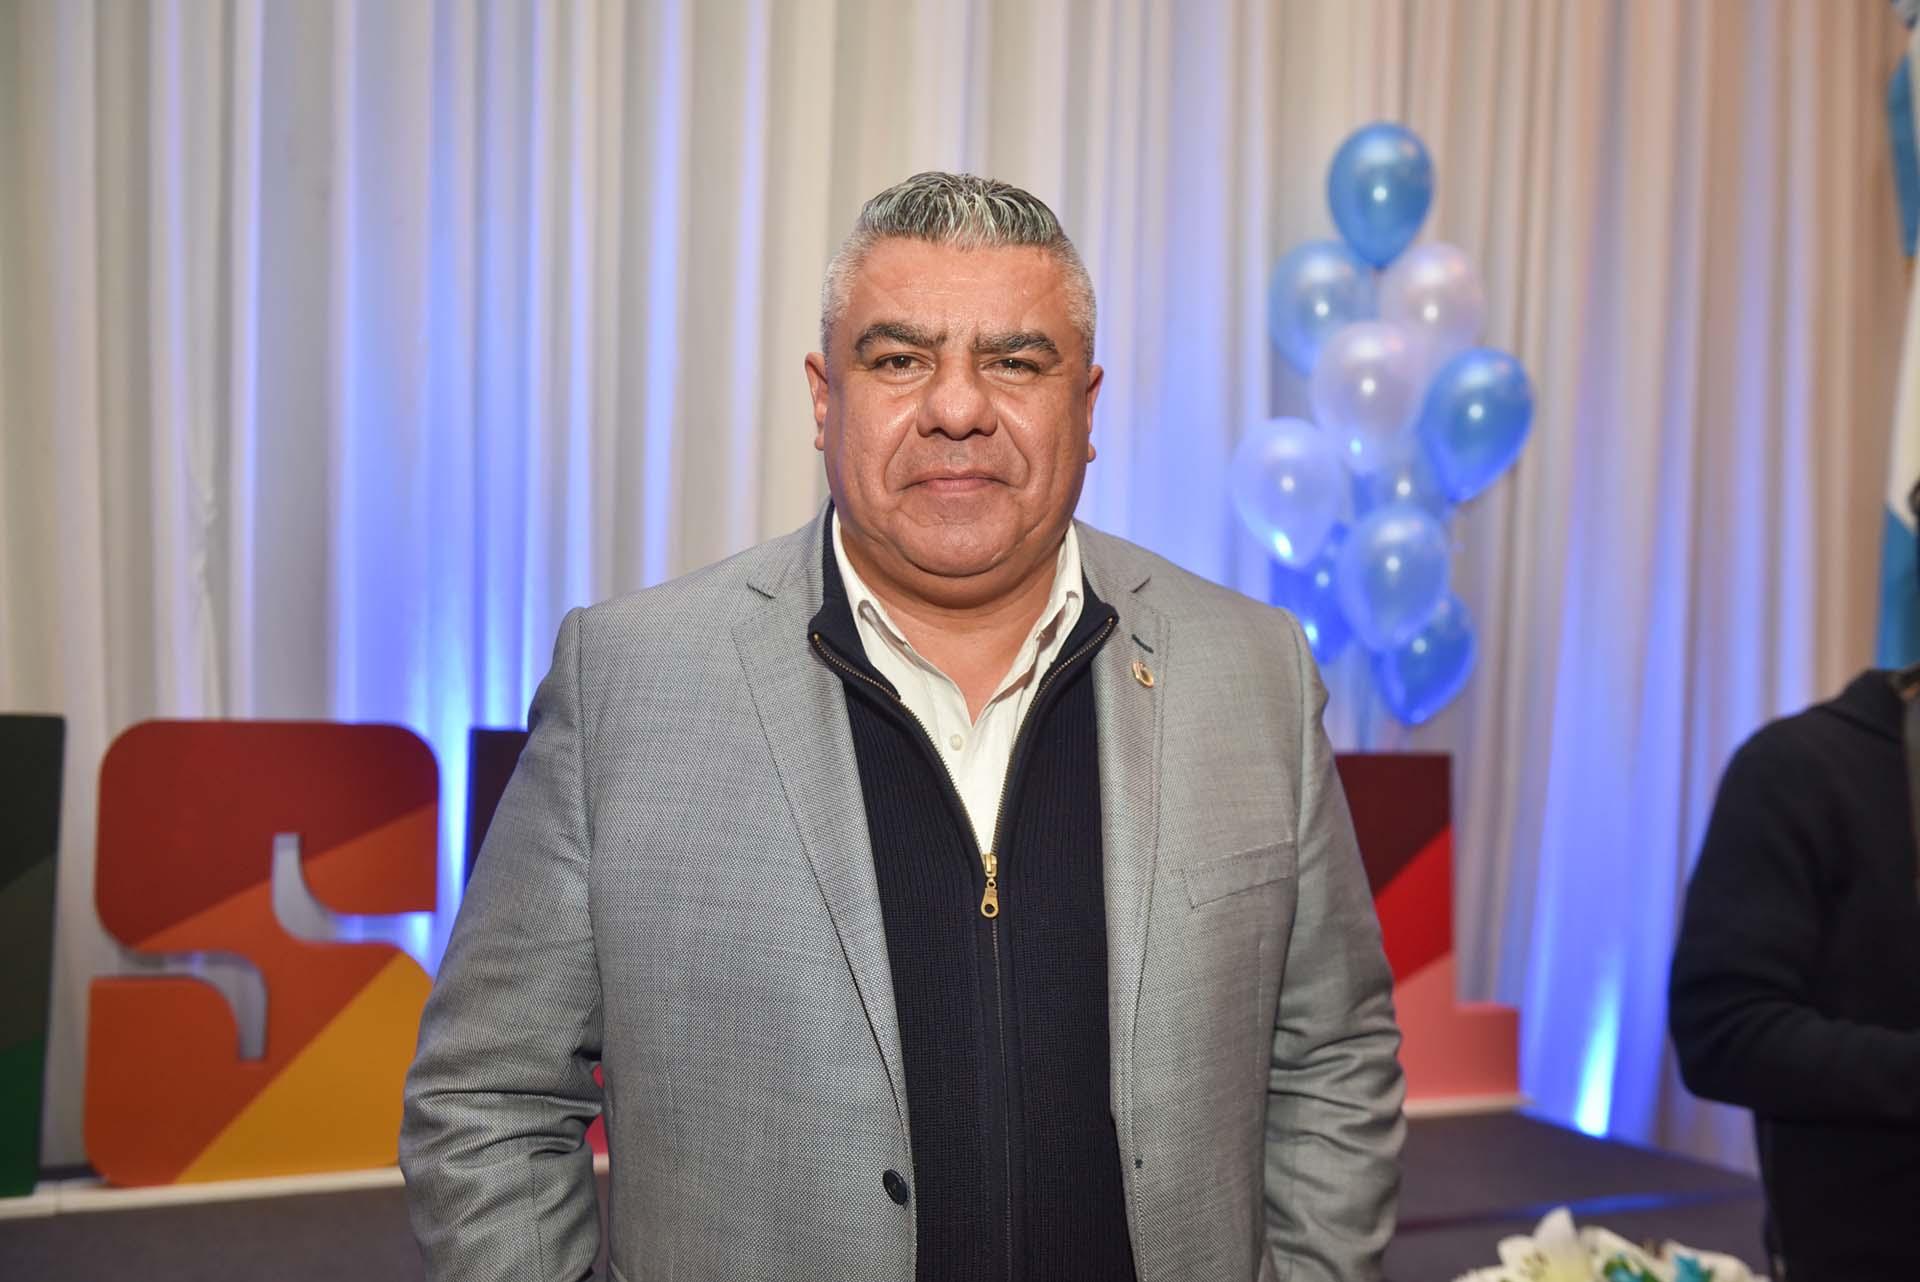 Claudio Fabián 'Chiqui' Tapia, presidente de AFA